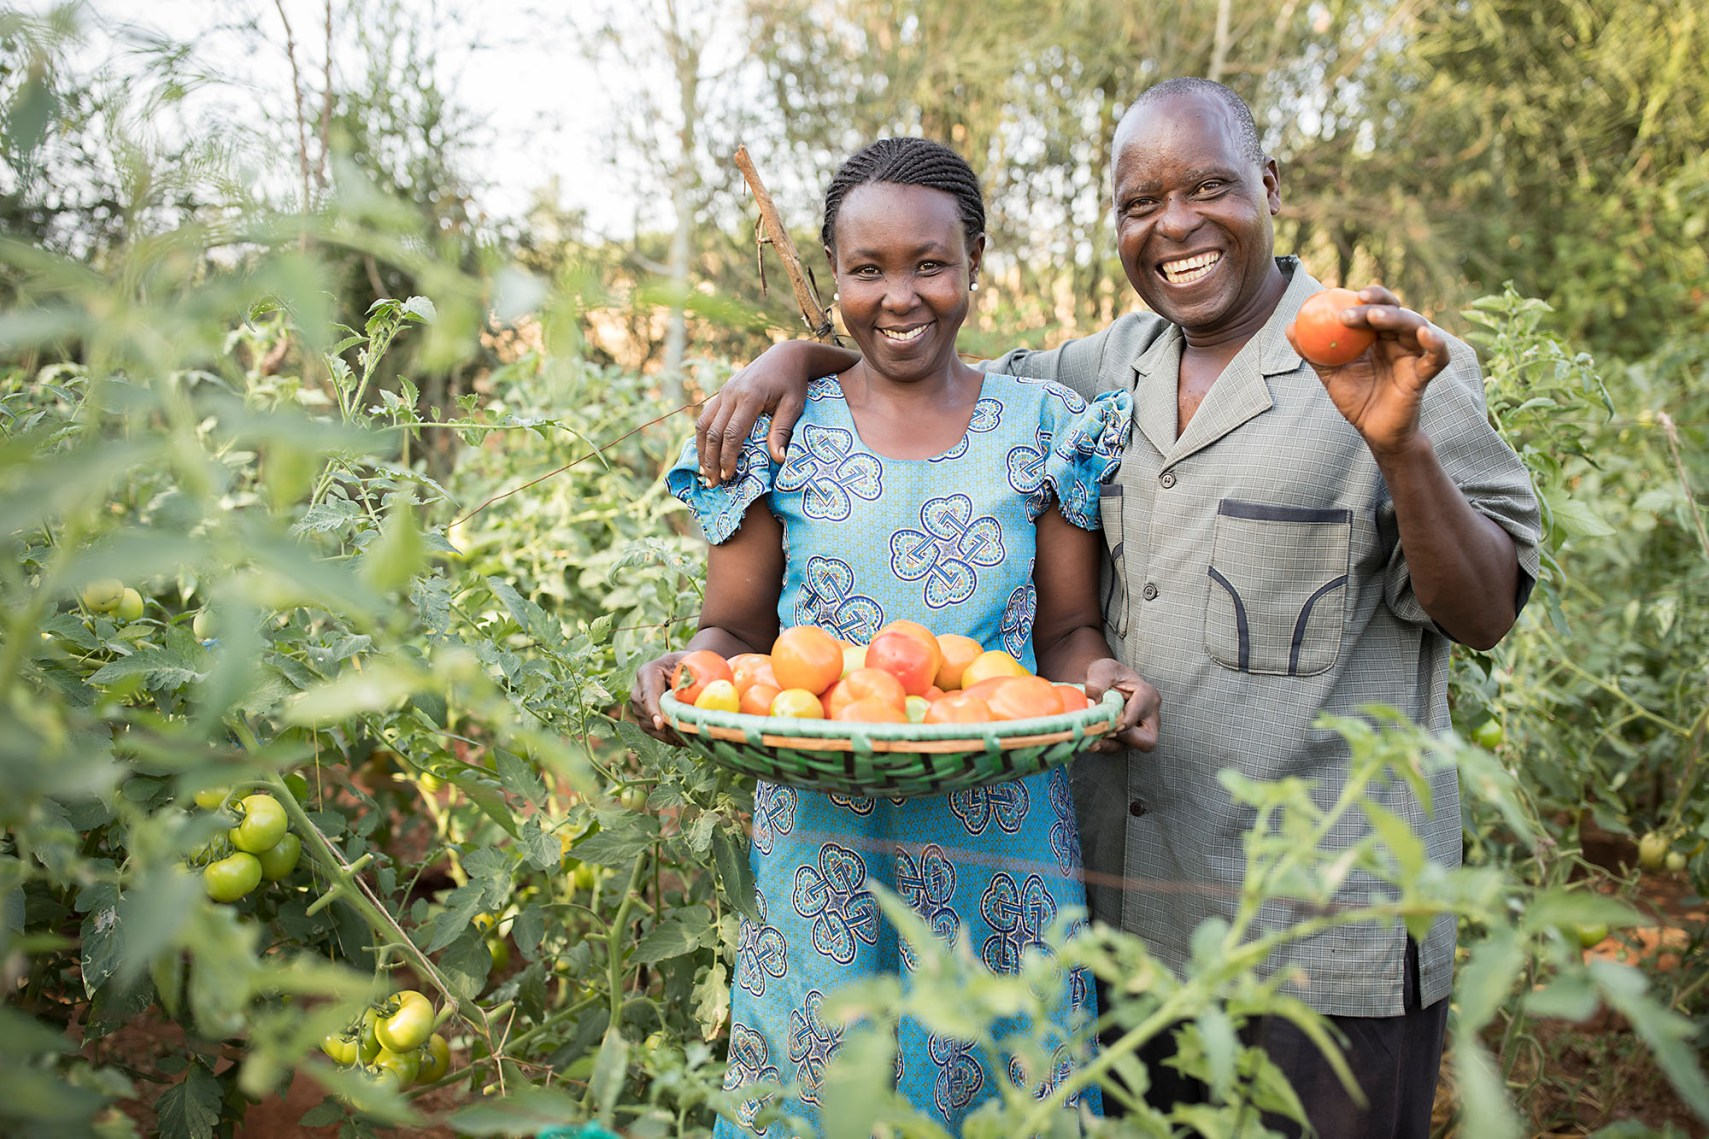 Agnes Nduku (46) and her husband Alfonse Nzuki (53) hold freshly harvested tomatoes on their family's small farm in Makueni County, Kenya.